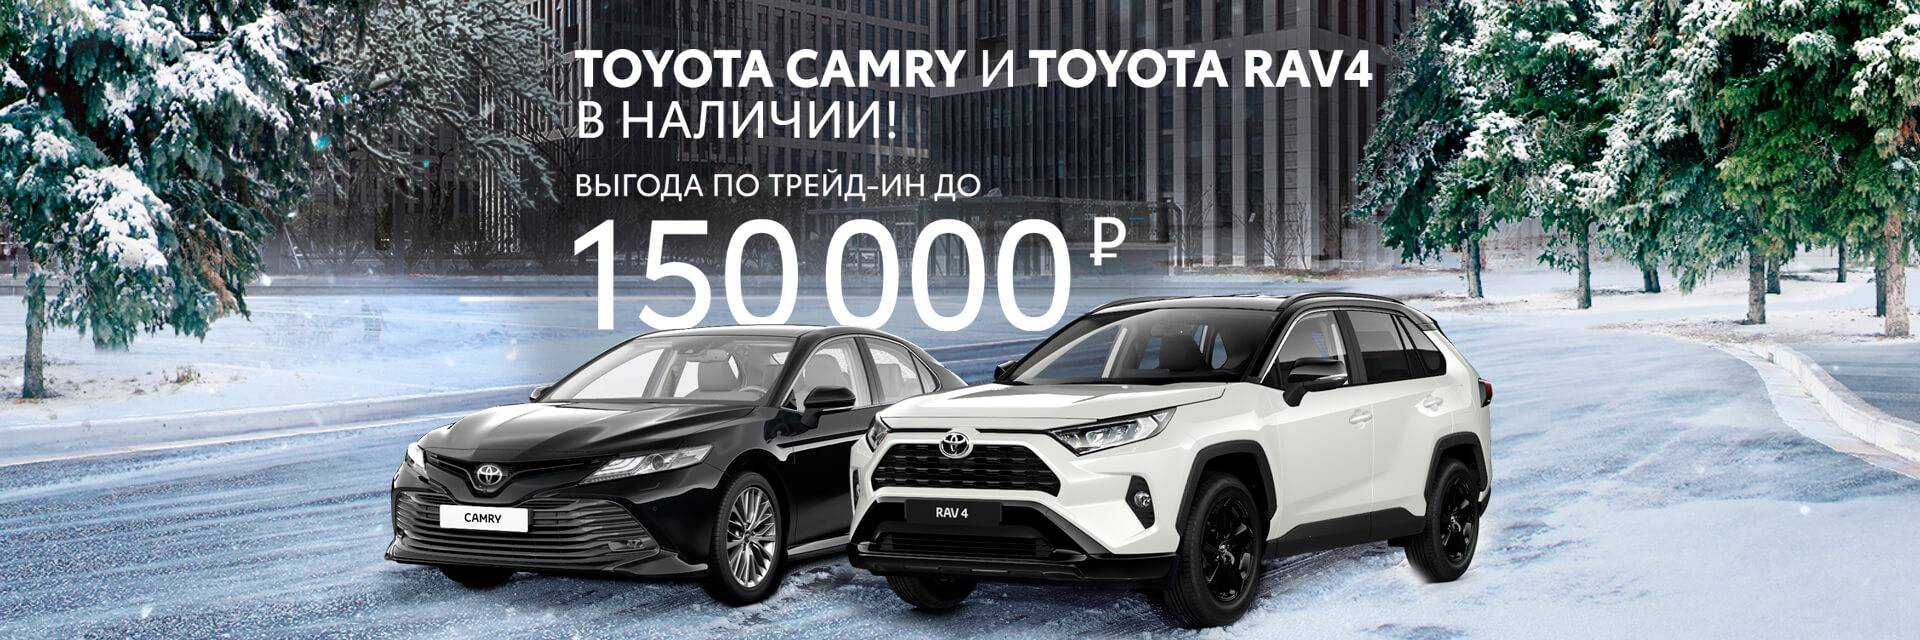 Последние автомобили Toyota по ценам 2020 года!